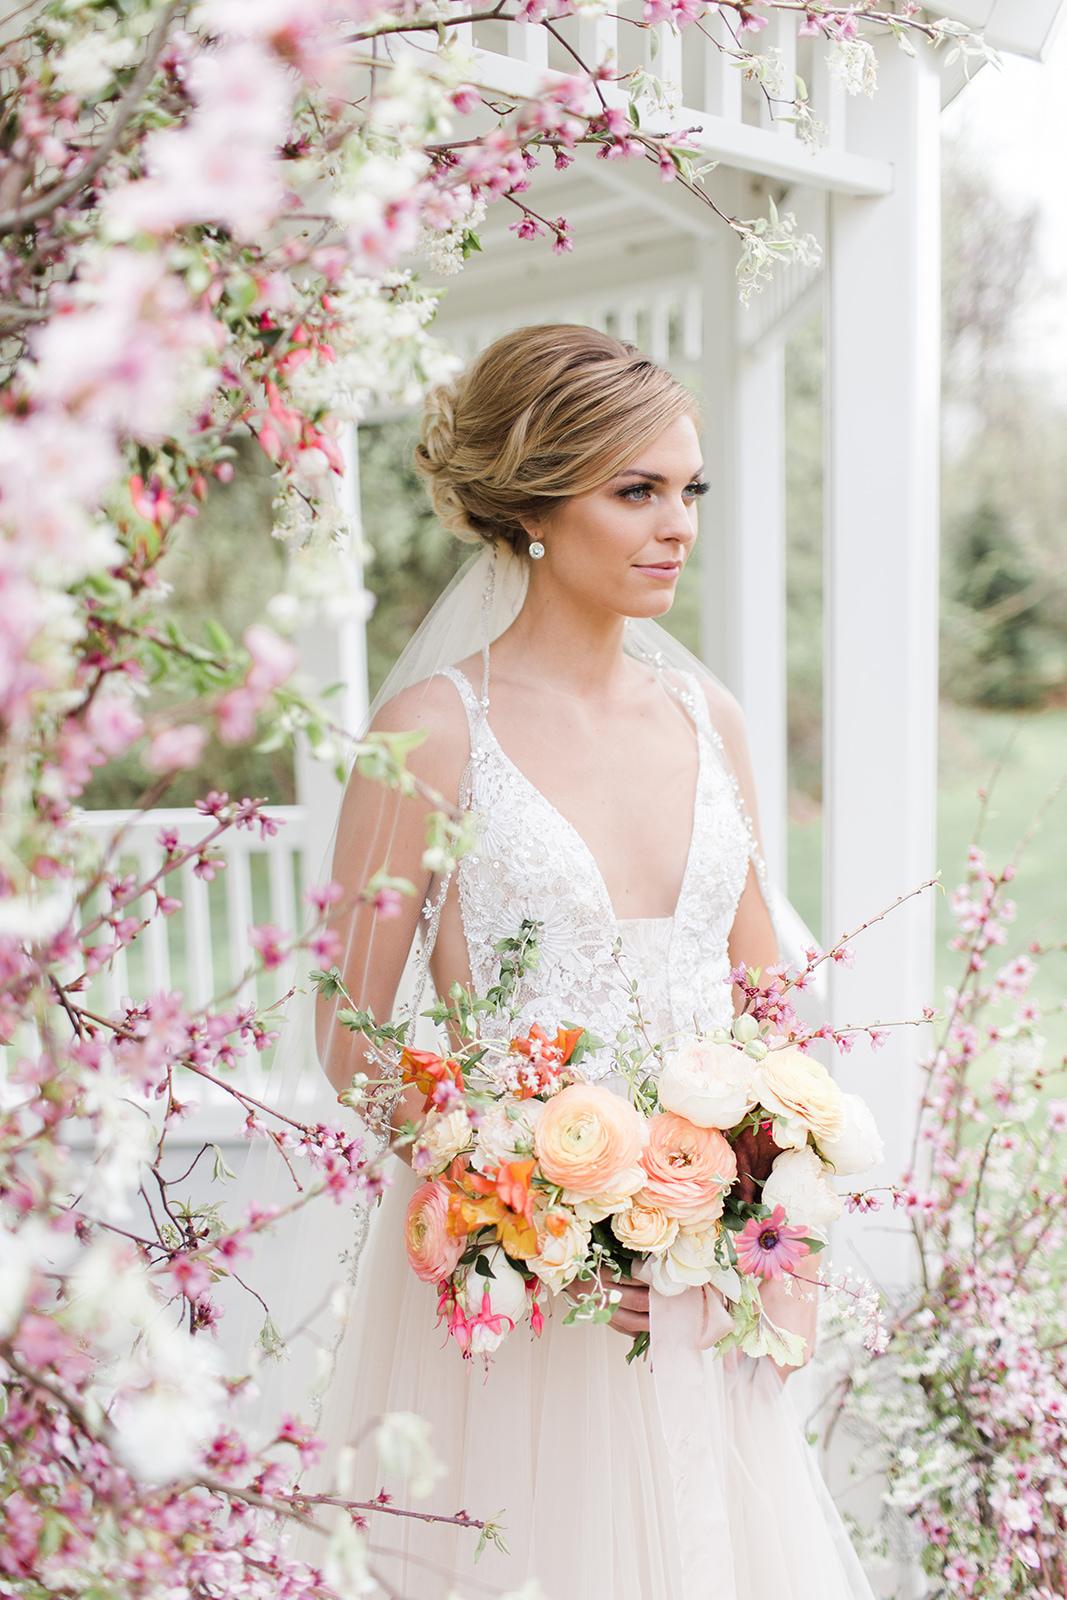 Makeup: Makeup by Jamie, Photo: Arielle Peters Photography, Venue: Apple Blossom Chapel & Gardens, Dress & Veil: Becker's Bridal, Hair: Tova Salon, Model: Maggie Sapp, Florals: The Day's Design